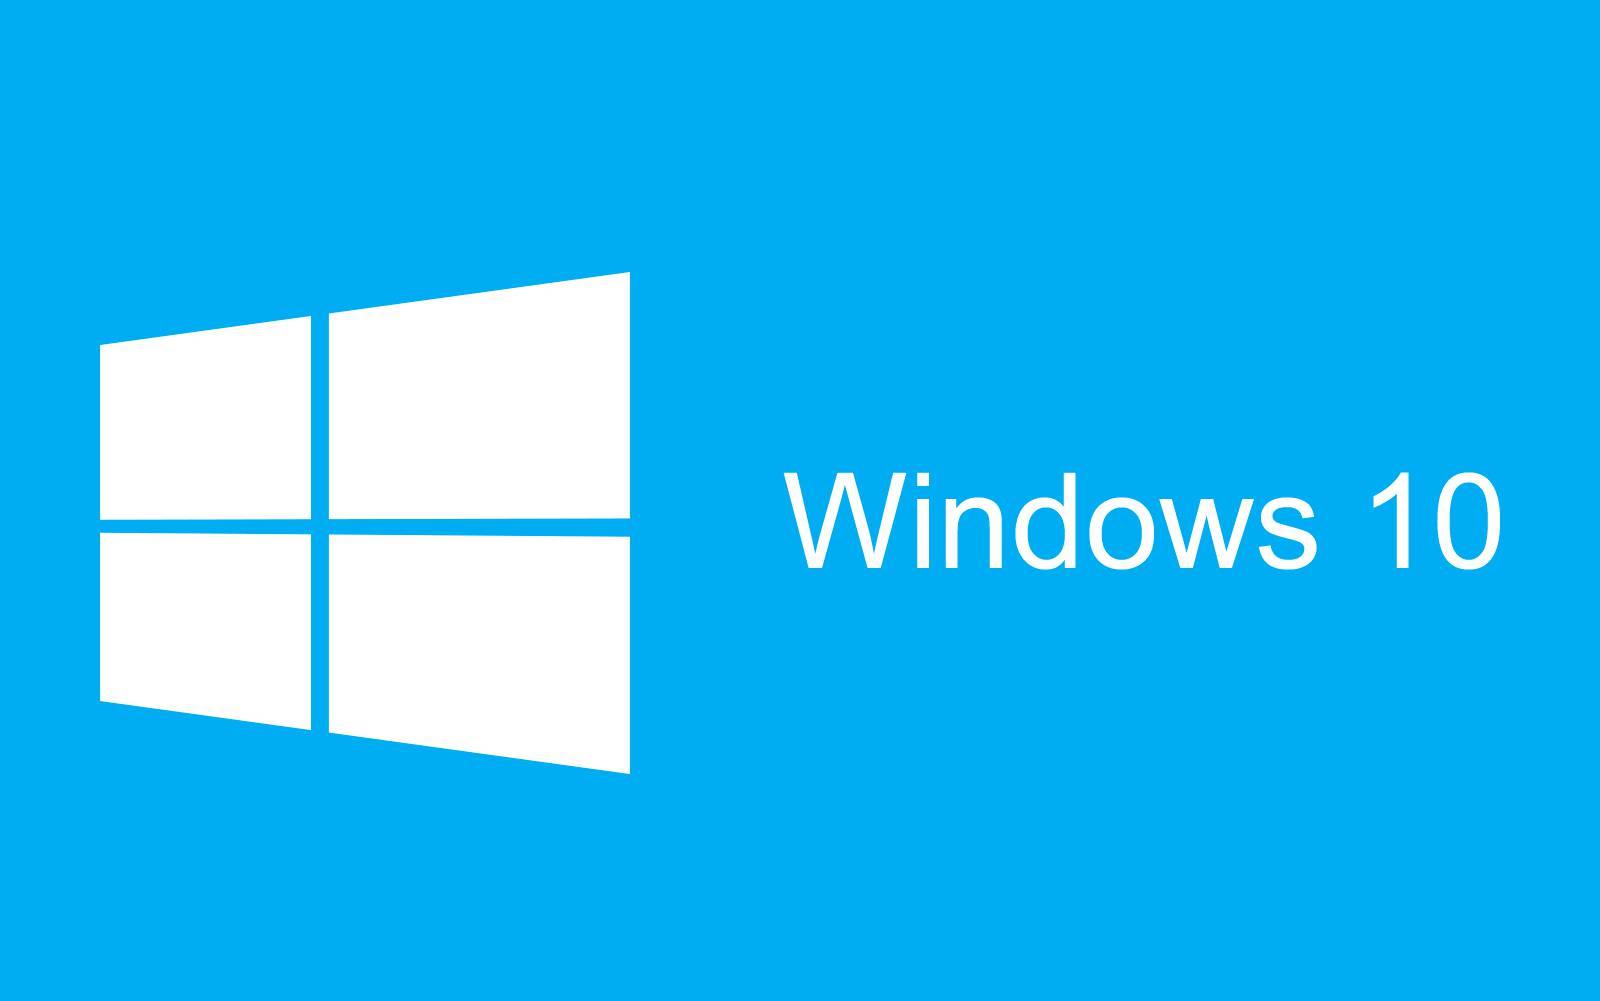 Windows 10 registre